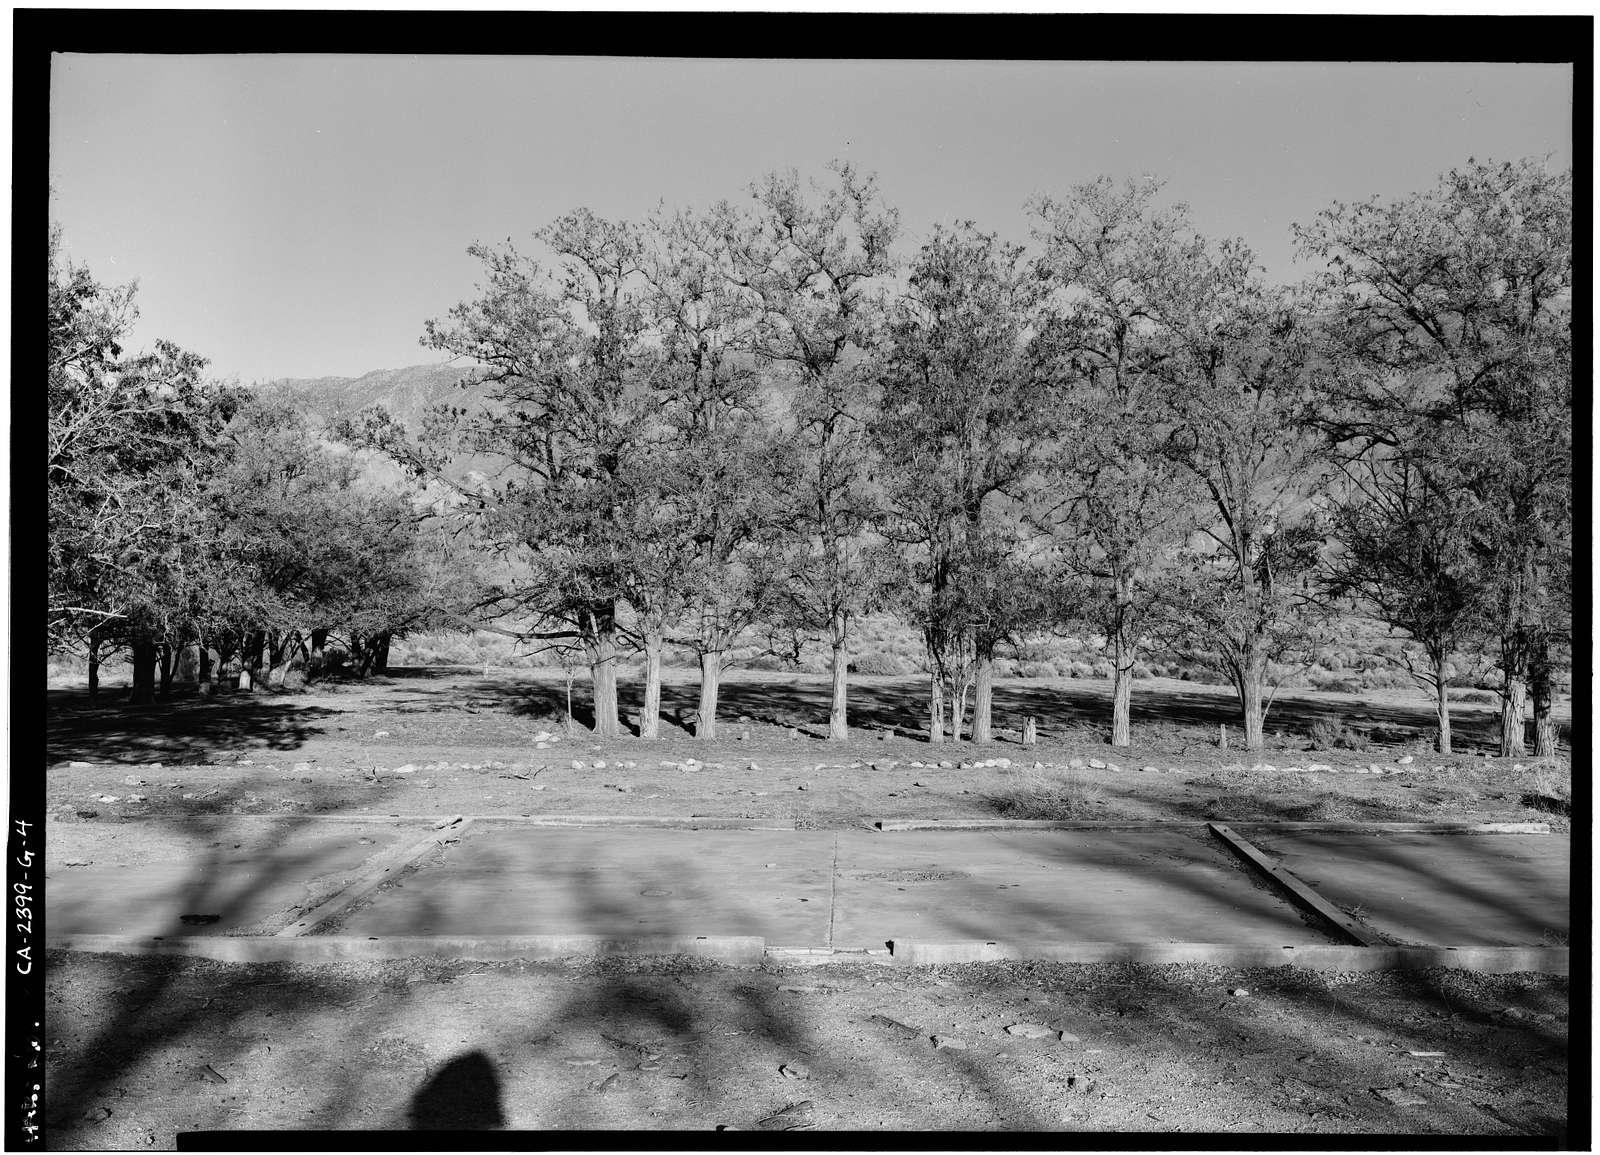 Manzanar War Relocation Center, Chicken Ranch, Independence, Inyo County, CA